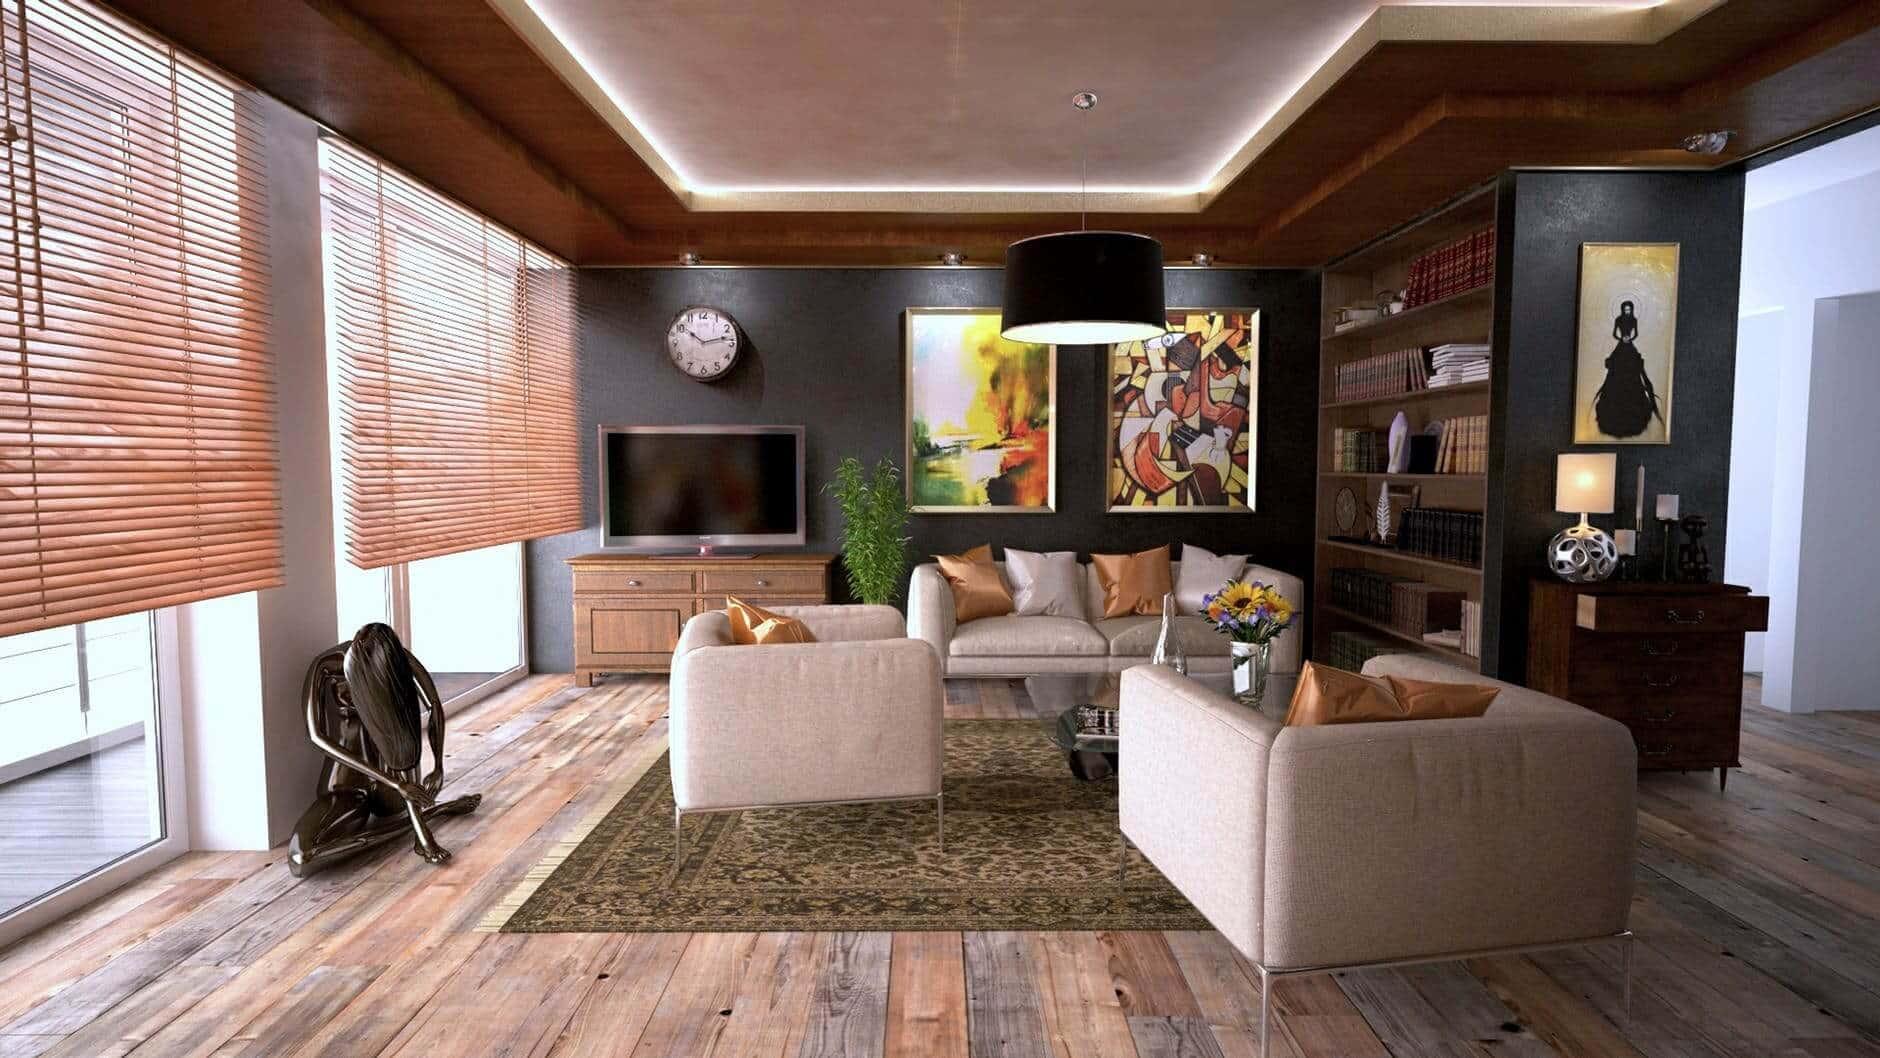 Rug Designs For Living Room 8